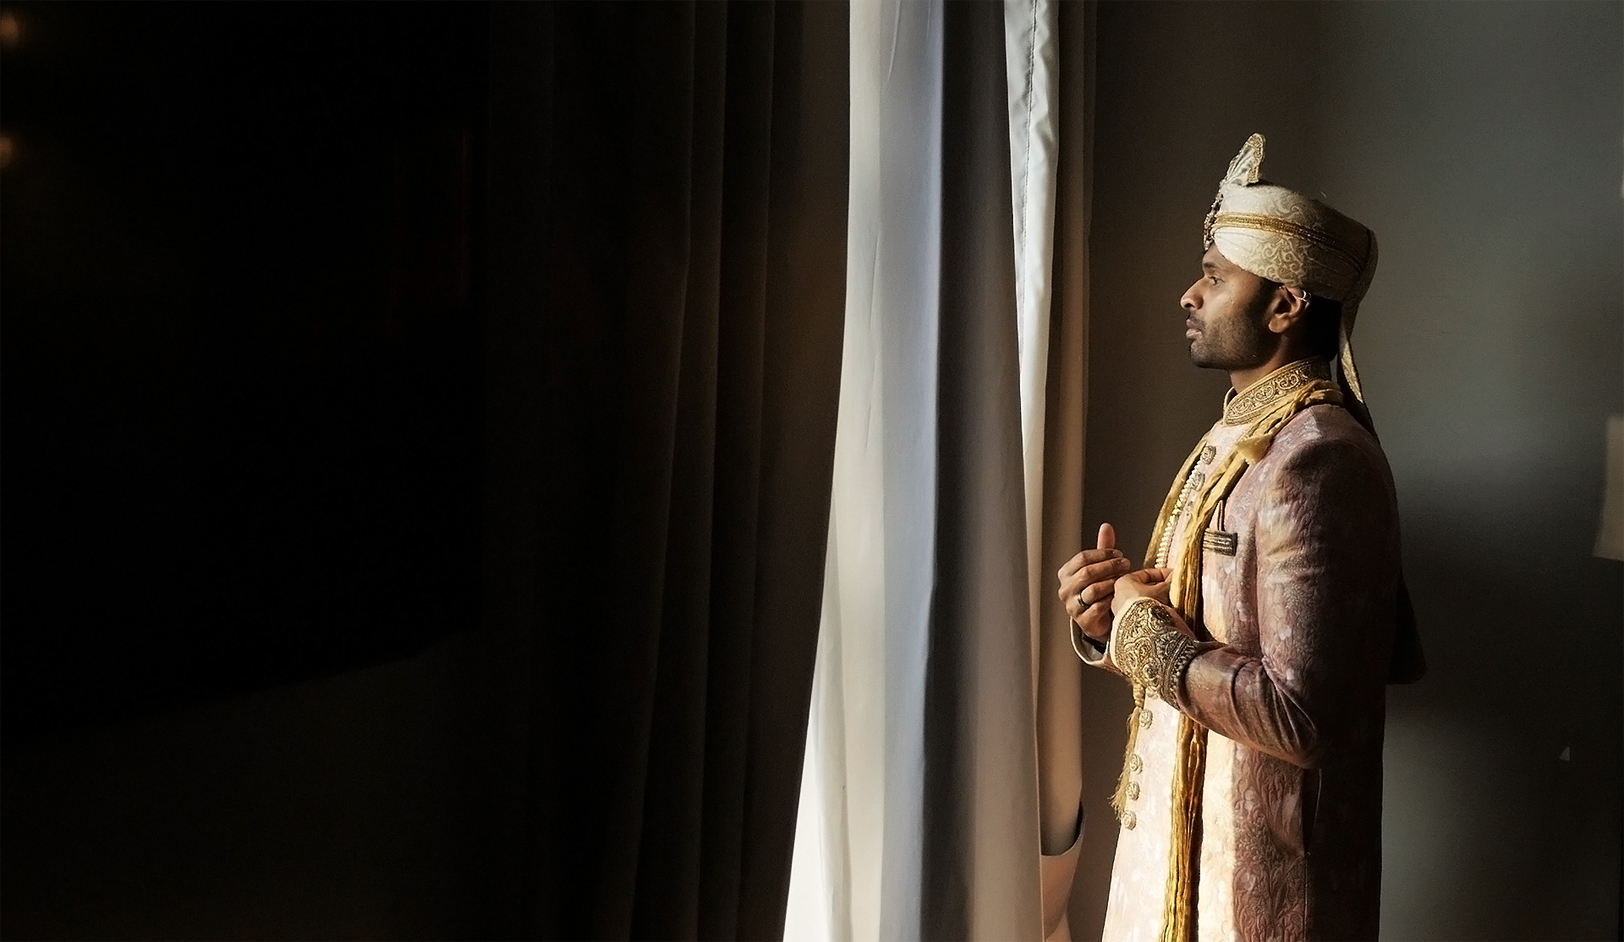 matrimonio-indiano-sposo-amalfi.jpg